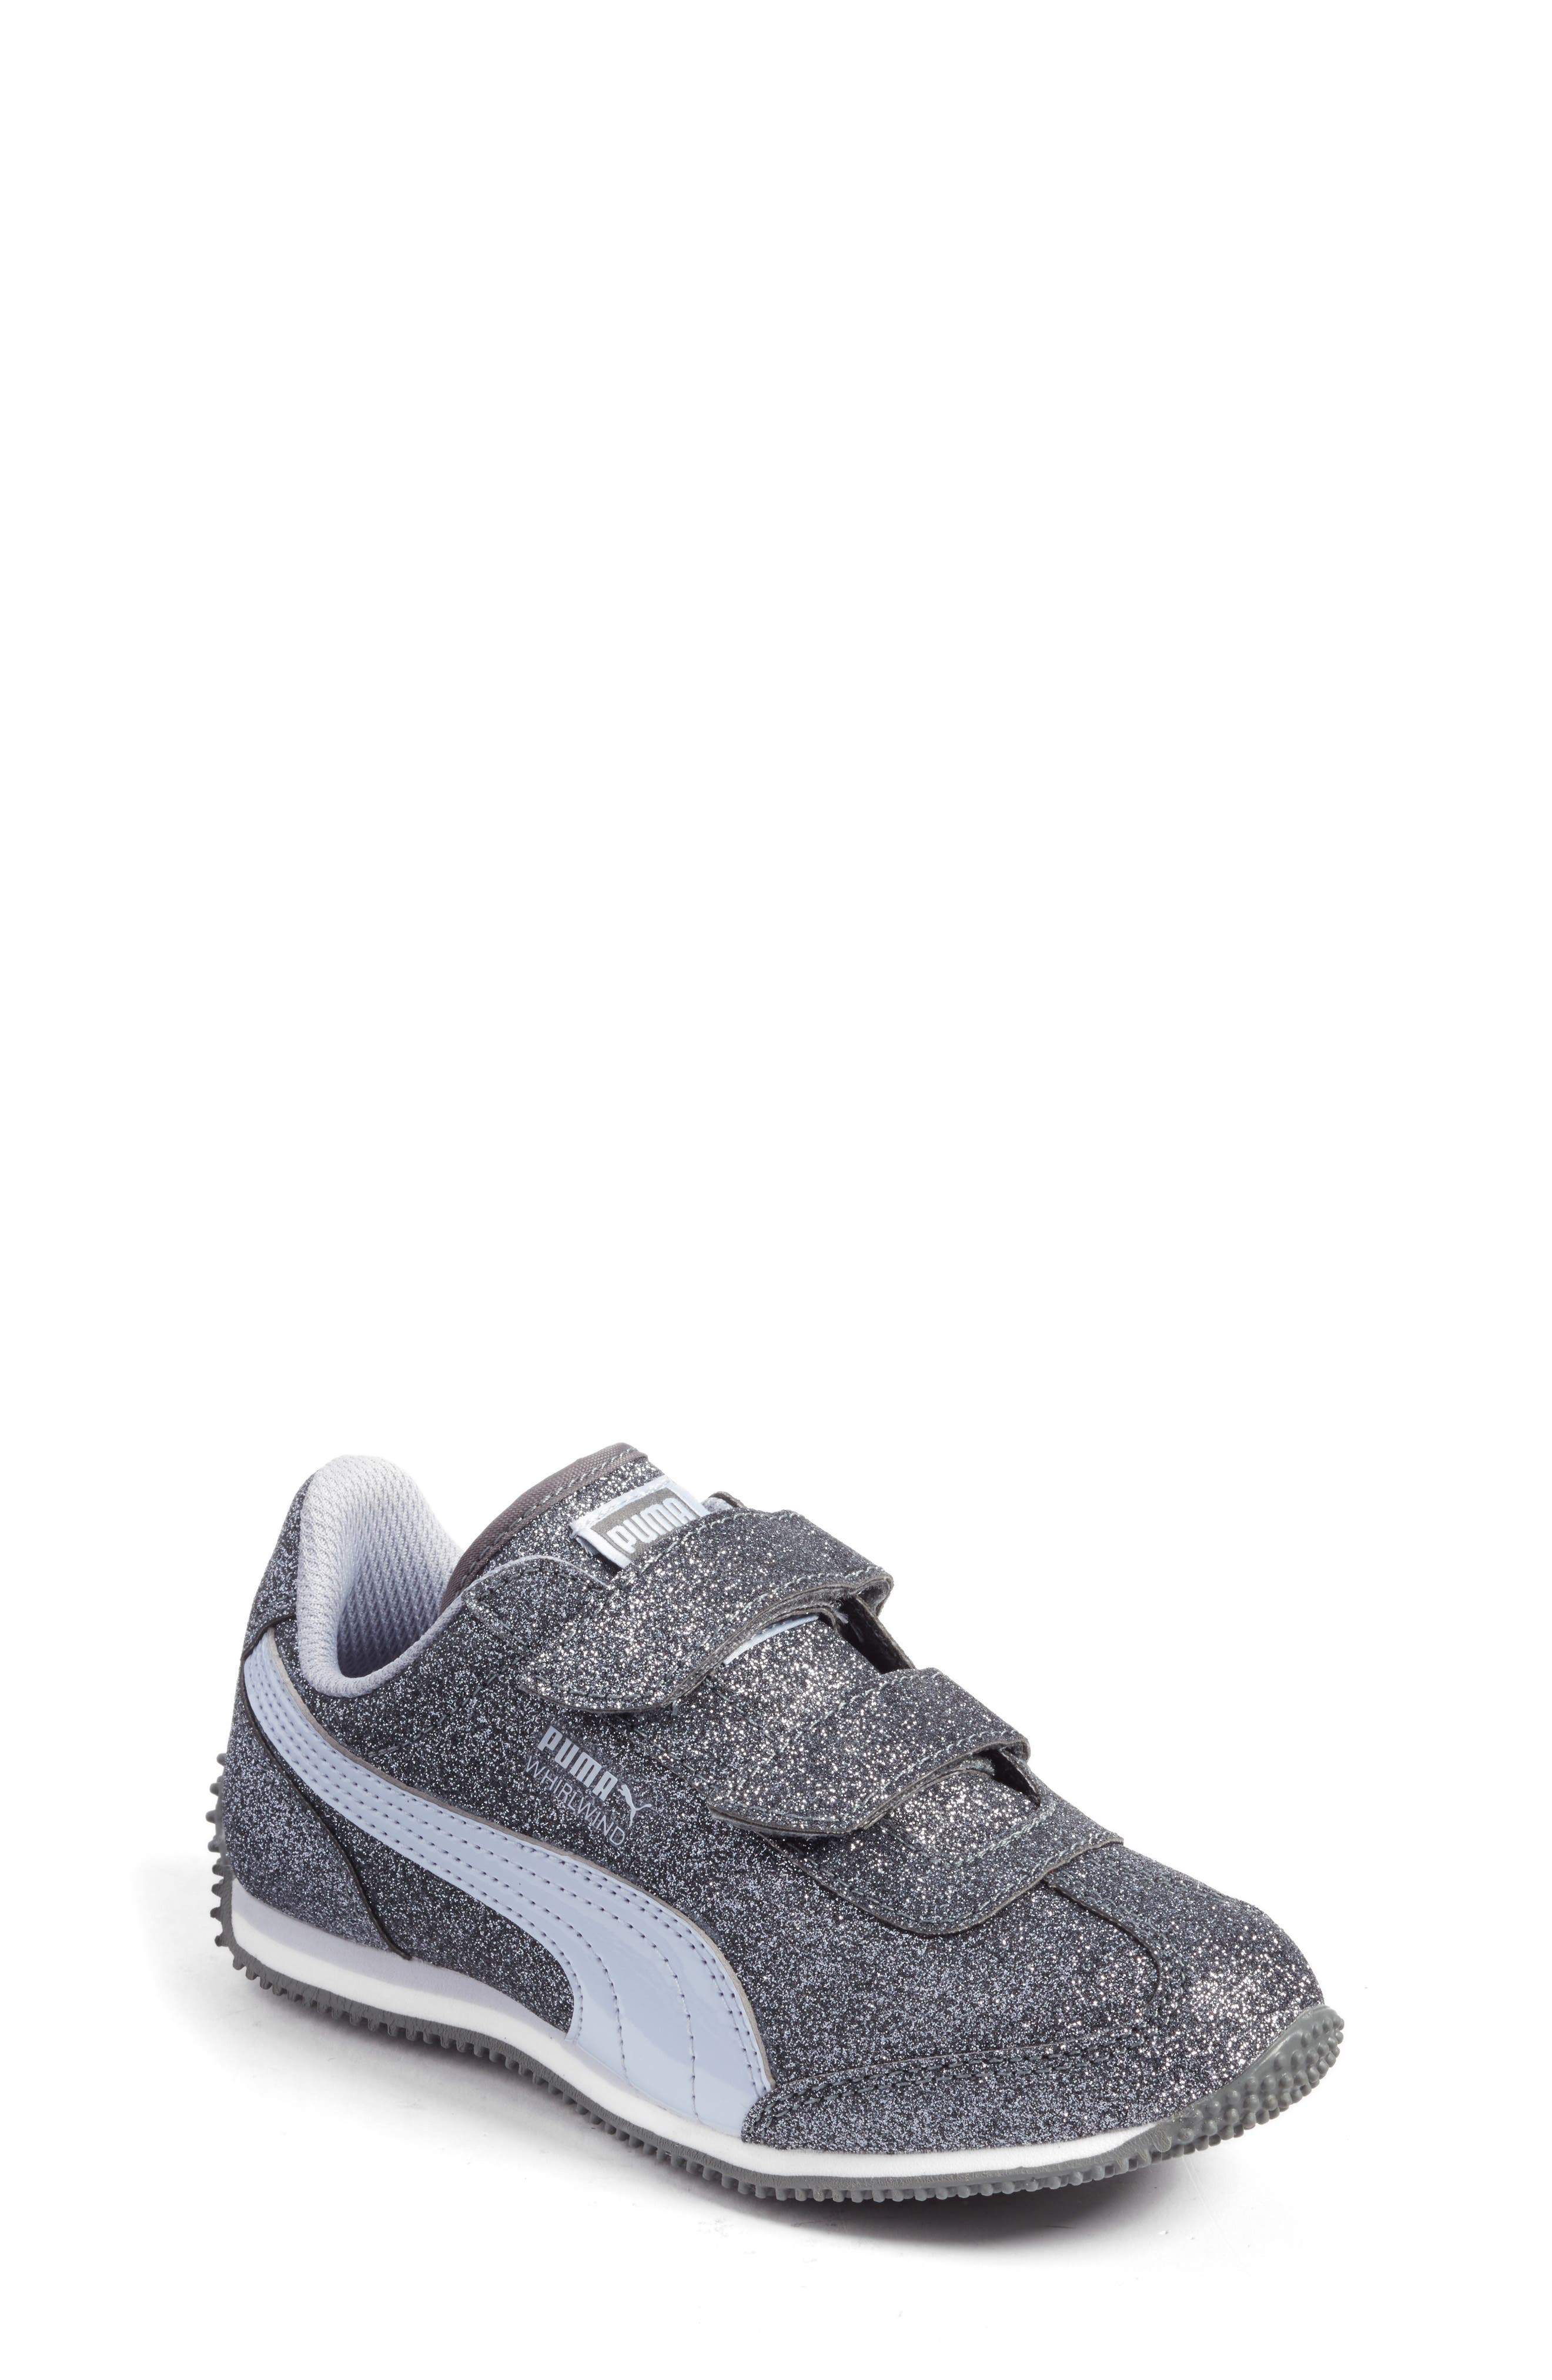 Main Image - PUMA Whirlwind Glitz Sneaker (Toddler, Little Kid & Big Kid)